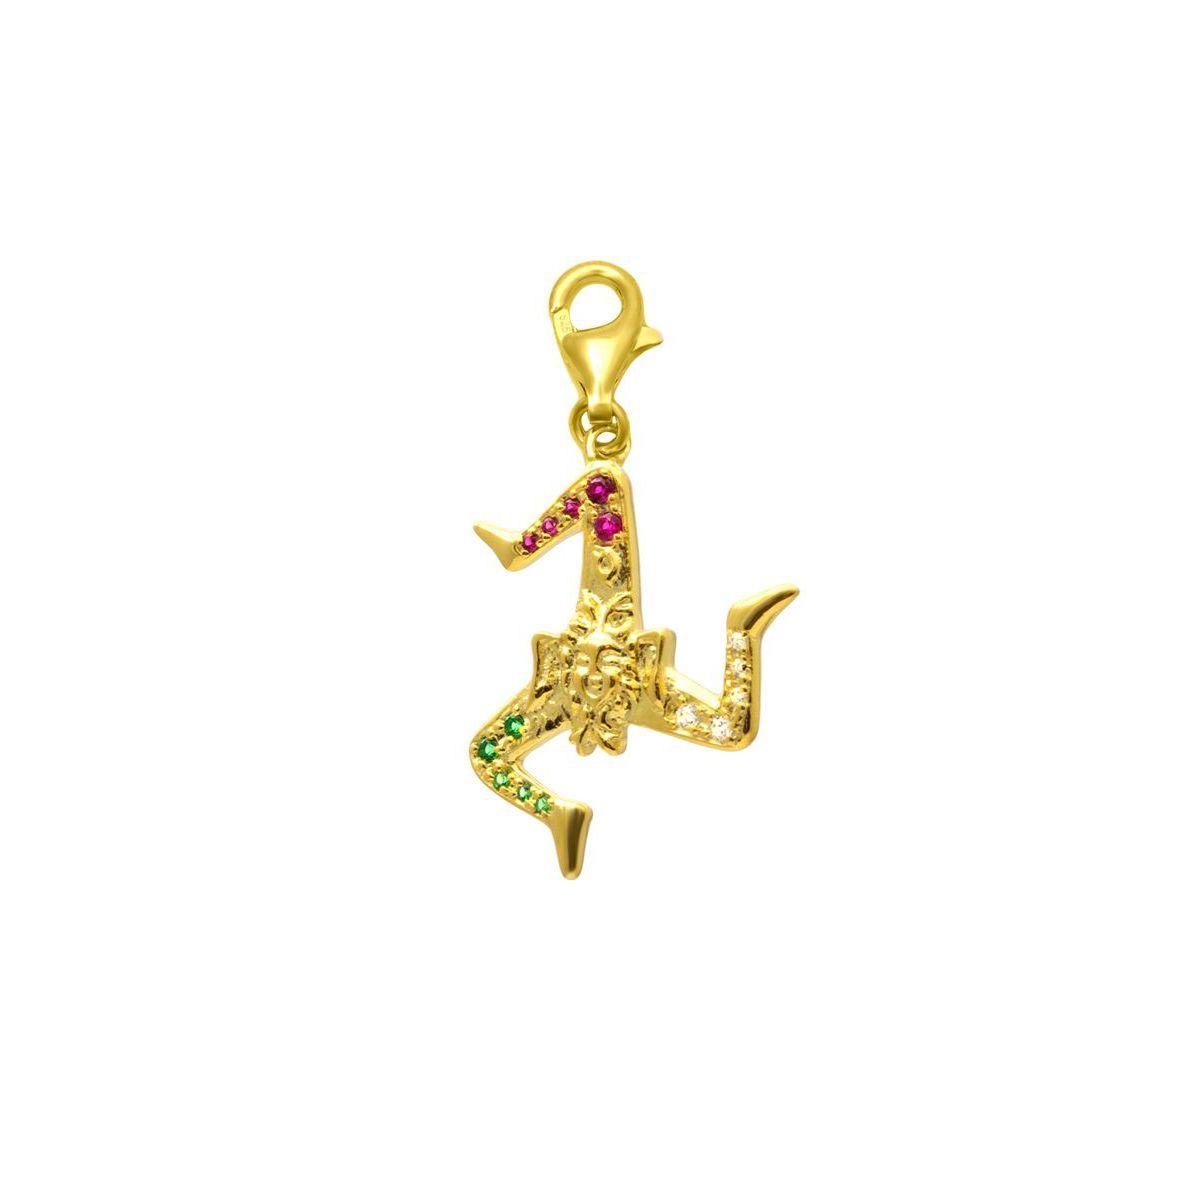 TRINACRIA GOLD Z CHARM Gold M'AMI SICILY JEWELS